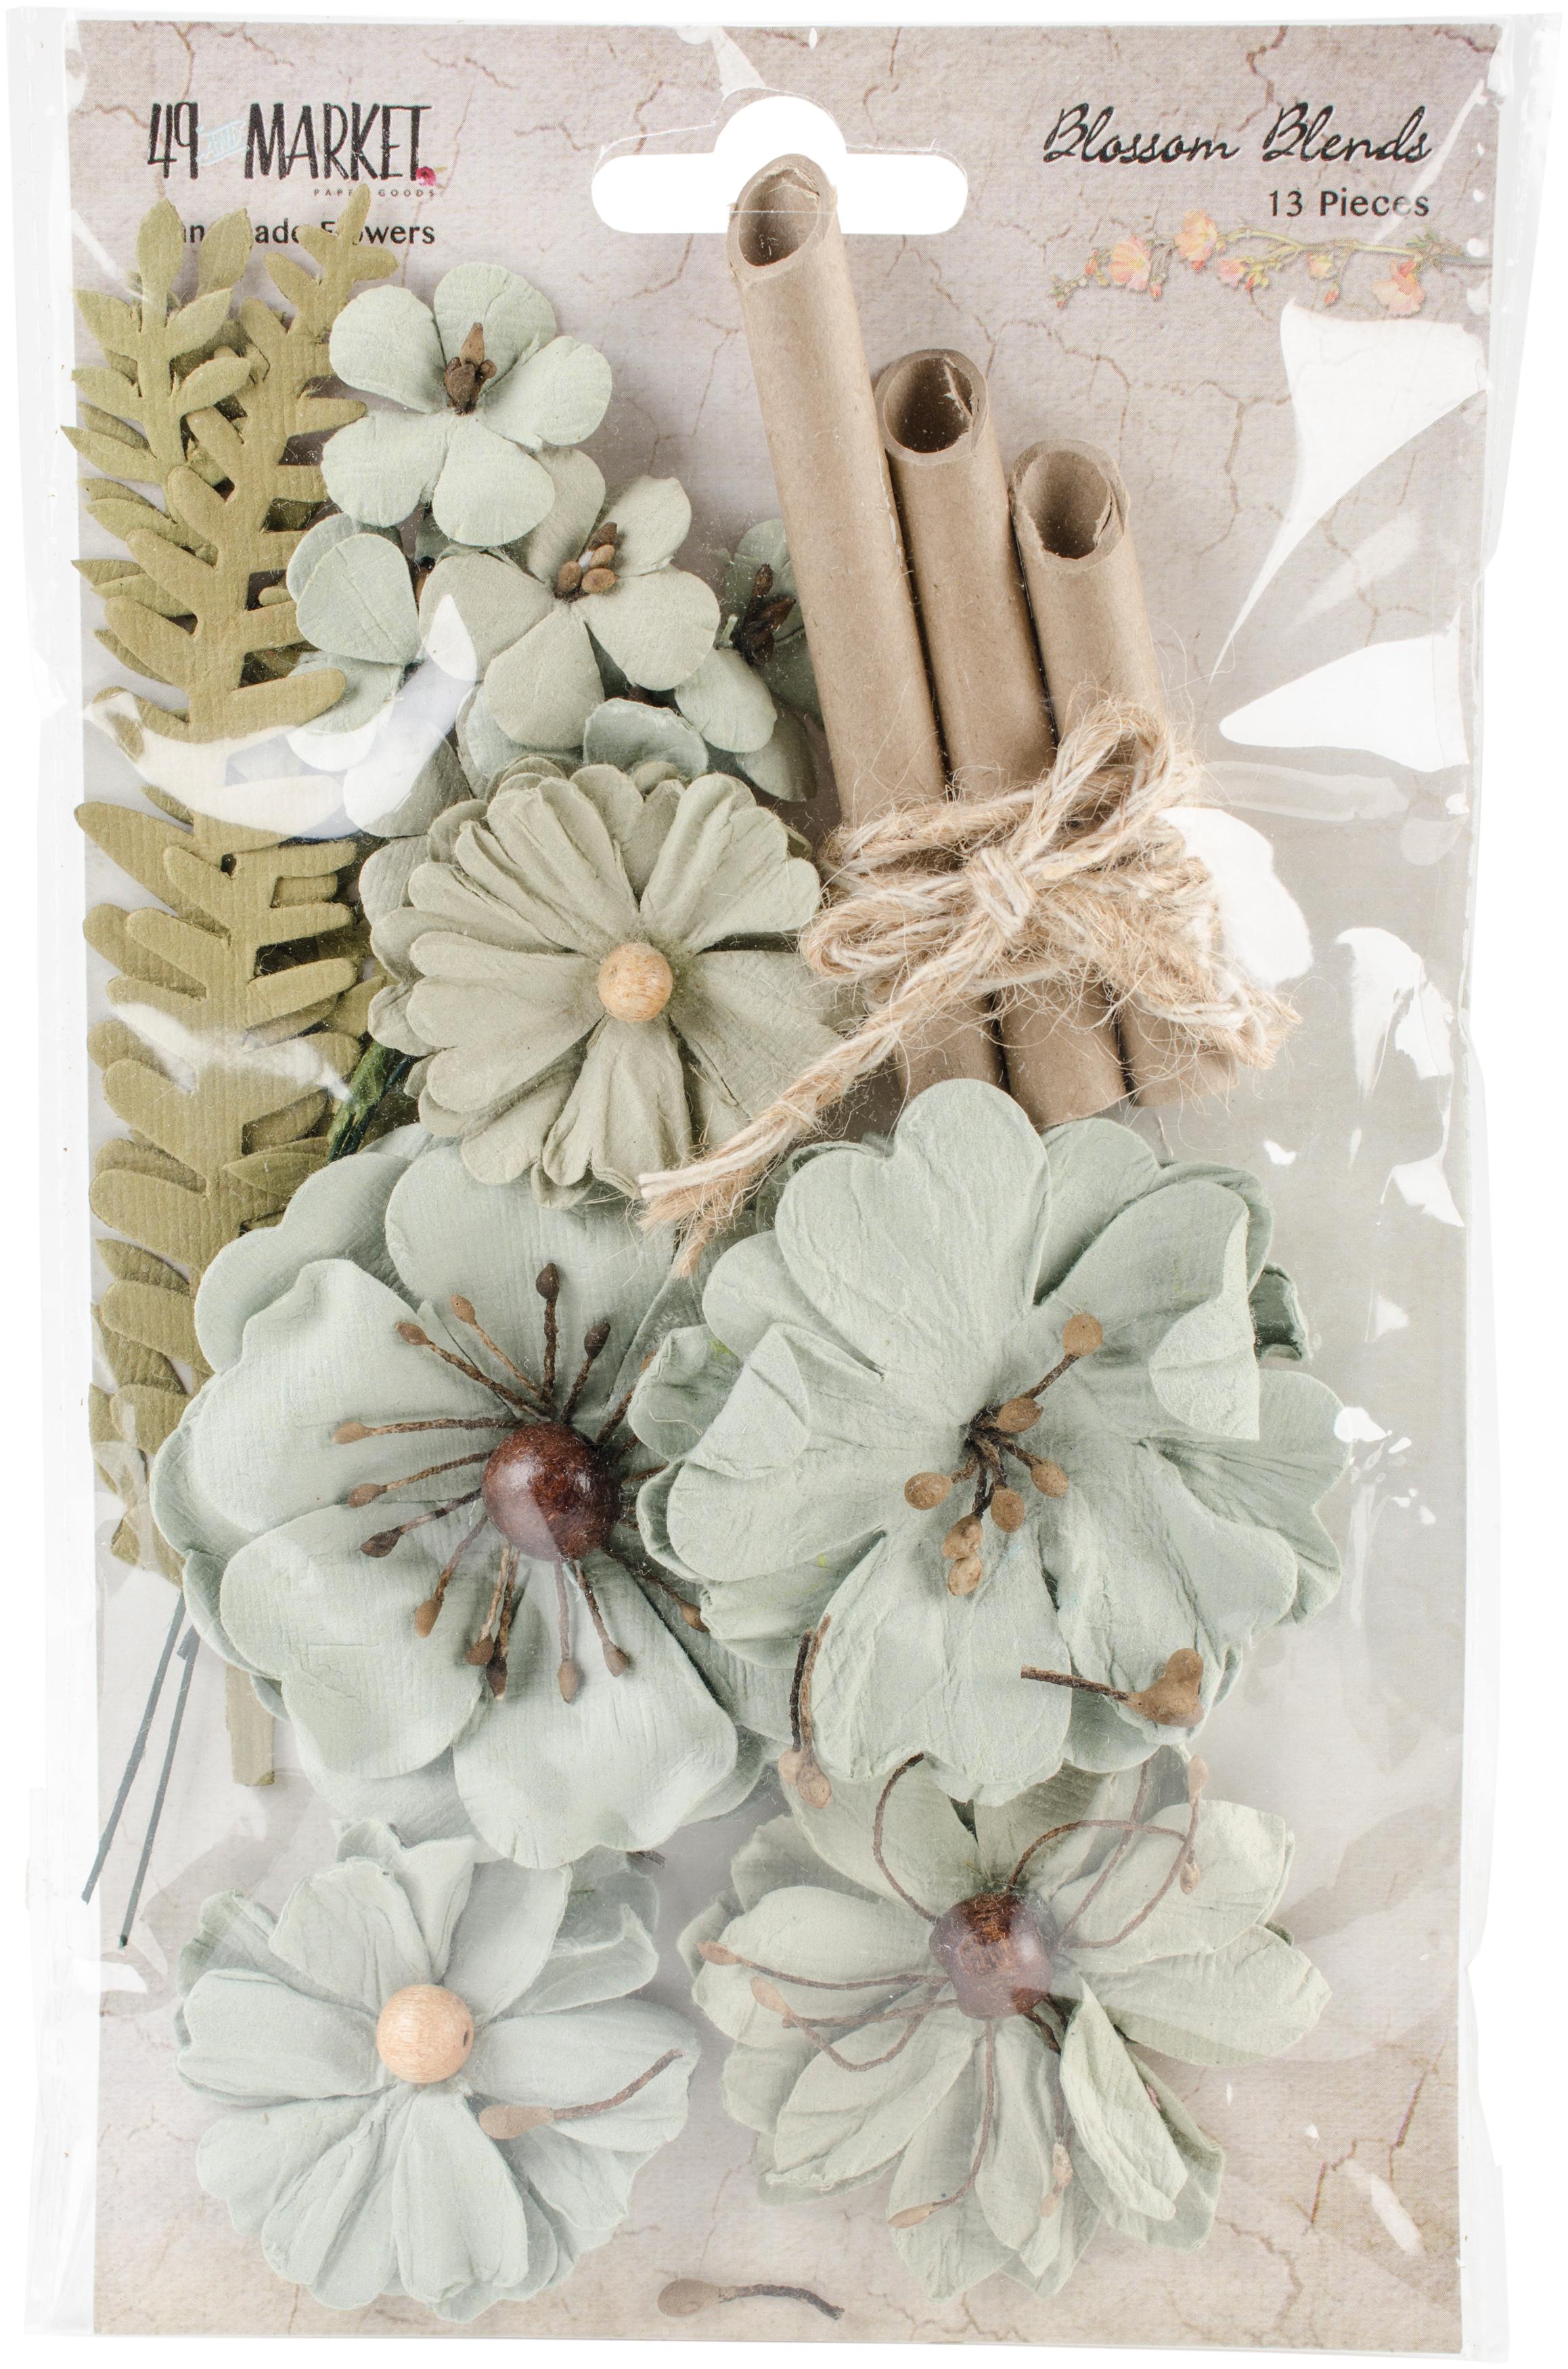 49 And Market Blossom Blends 13/Pkg-Aloe, 2.5